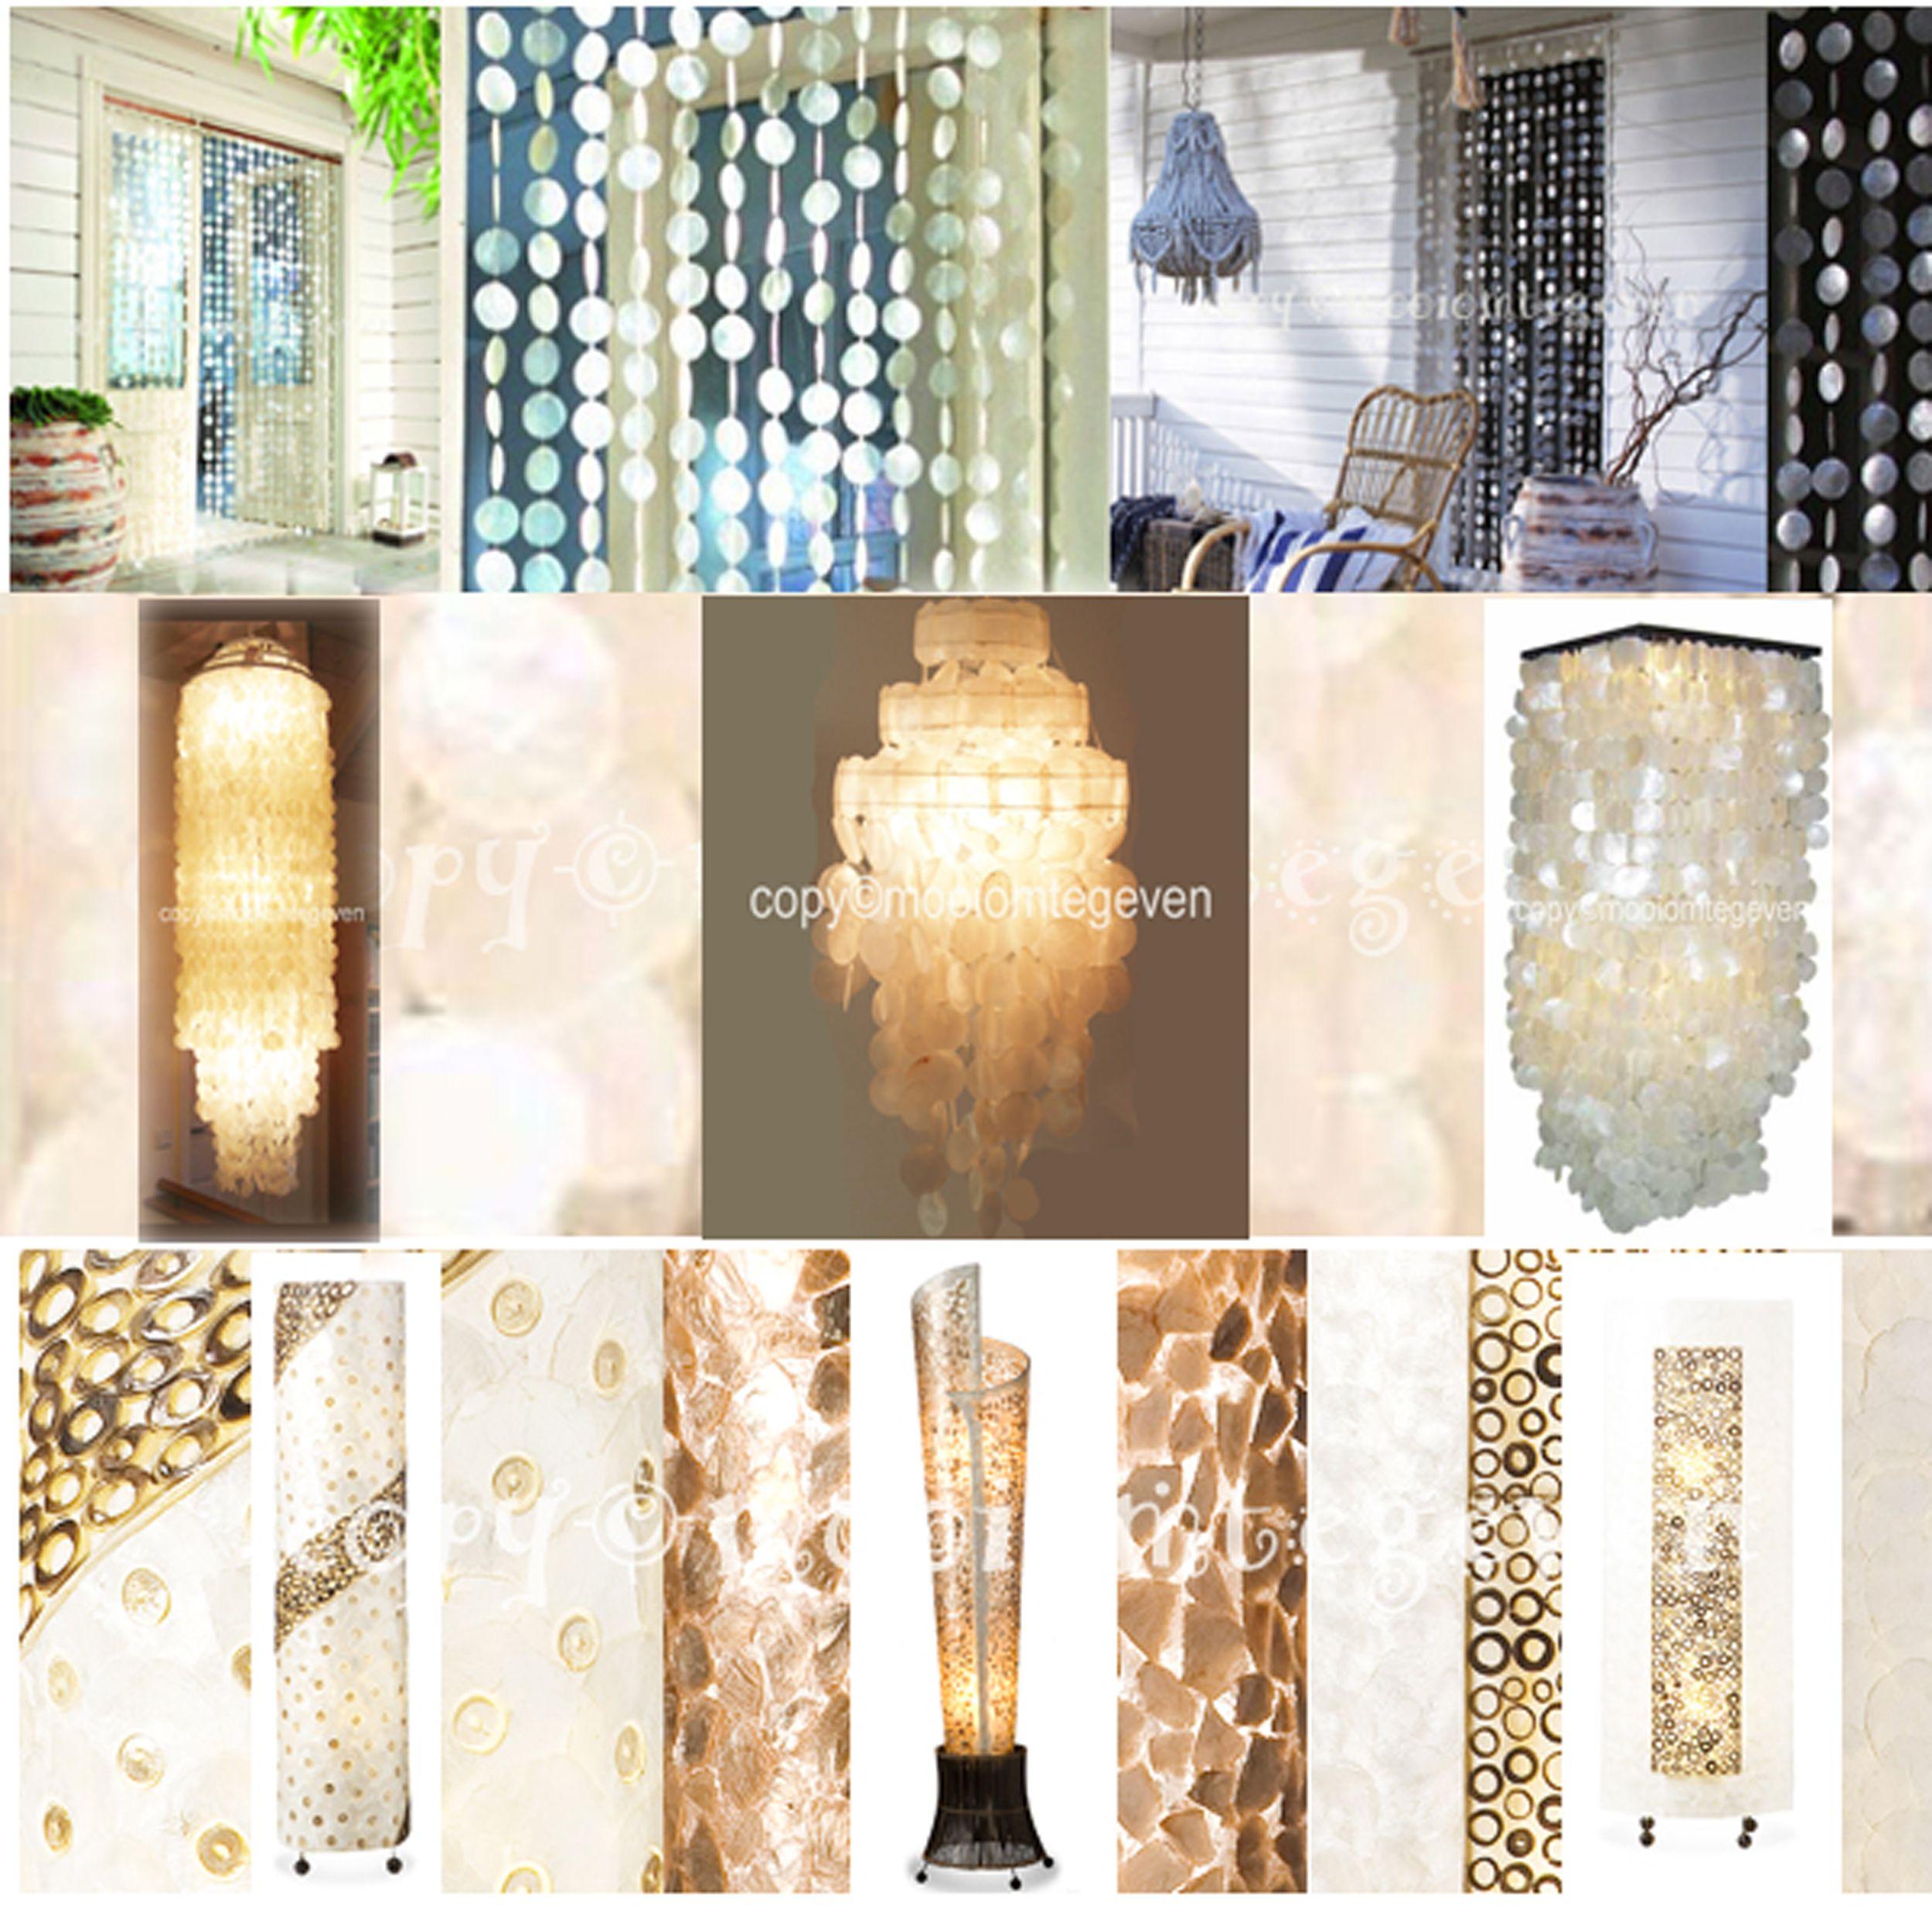 Nice Prachtige Capiz schelpen plafond lampen in Retro Ibiza style Deze extravagante schitterende plafond hang